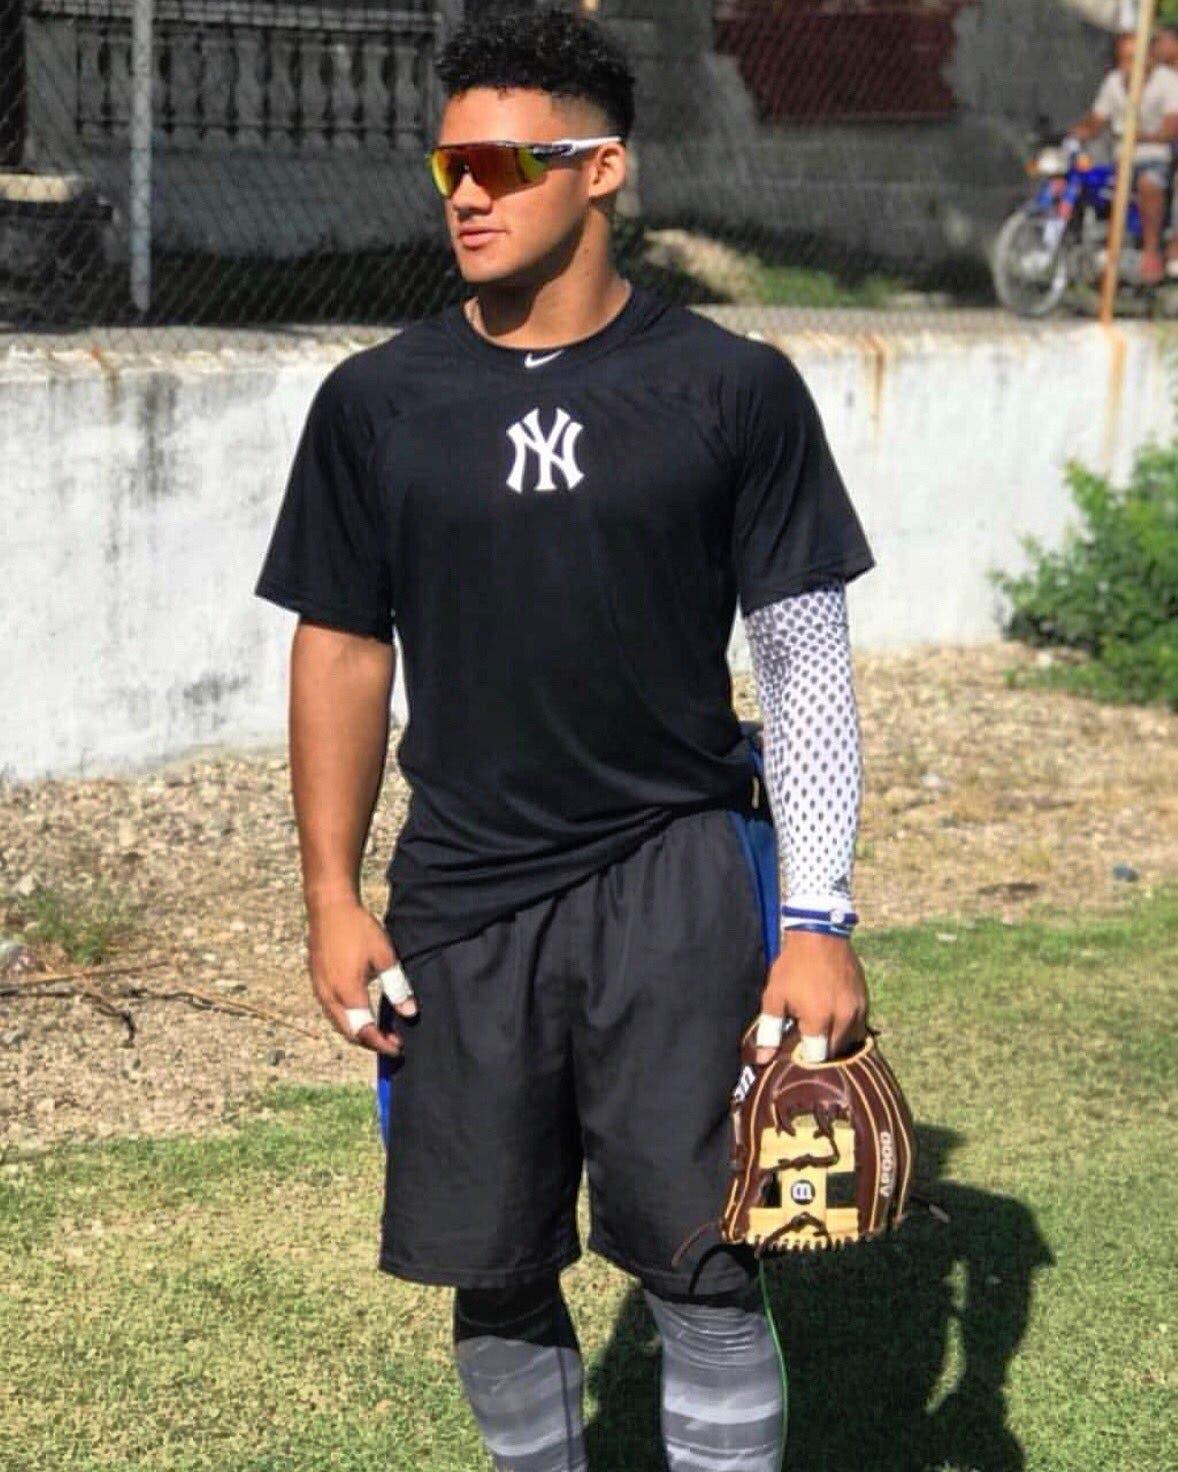 Yankees fichan por 5,4 millones de dólares a prospecto dominicano Jasson Domínguez